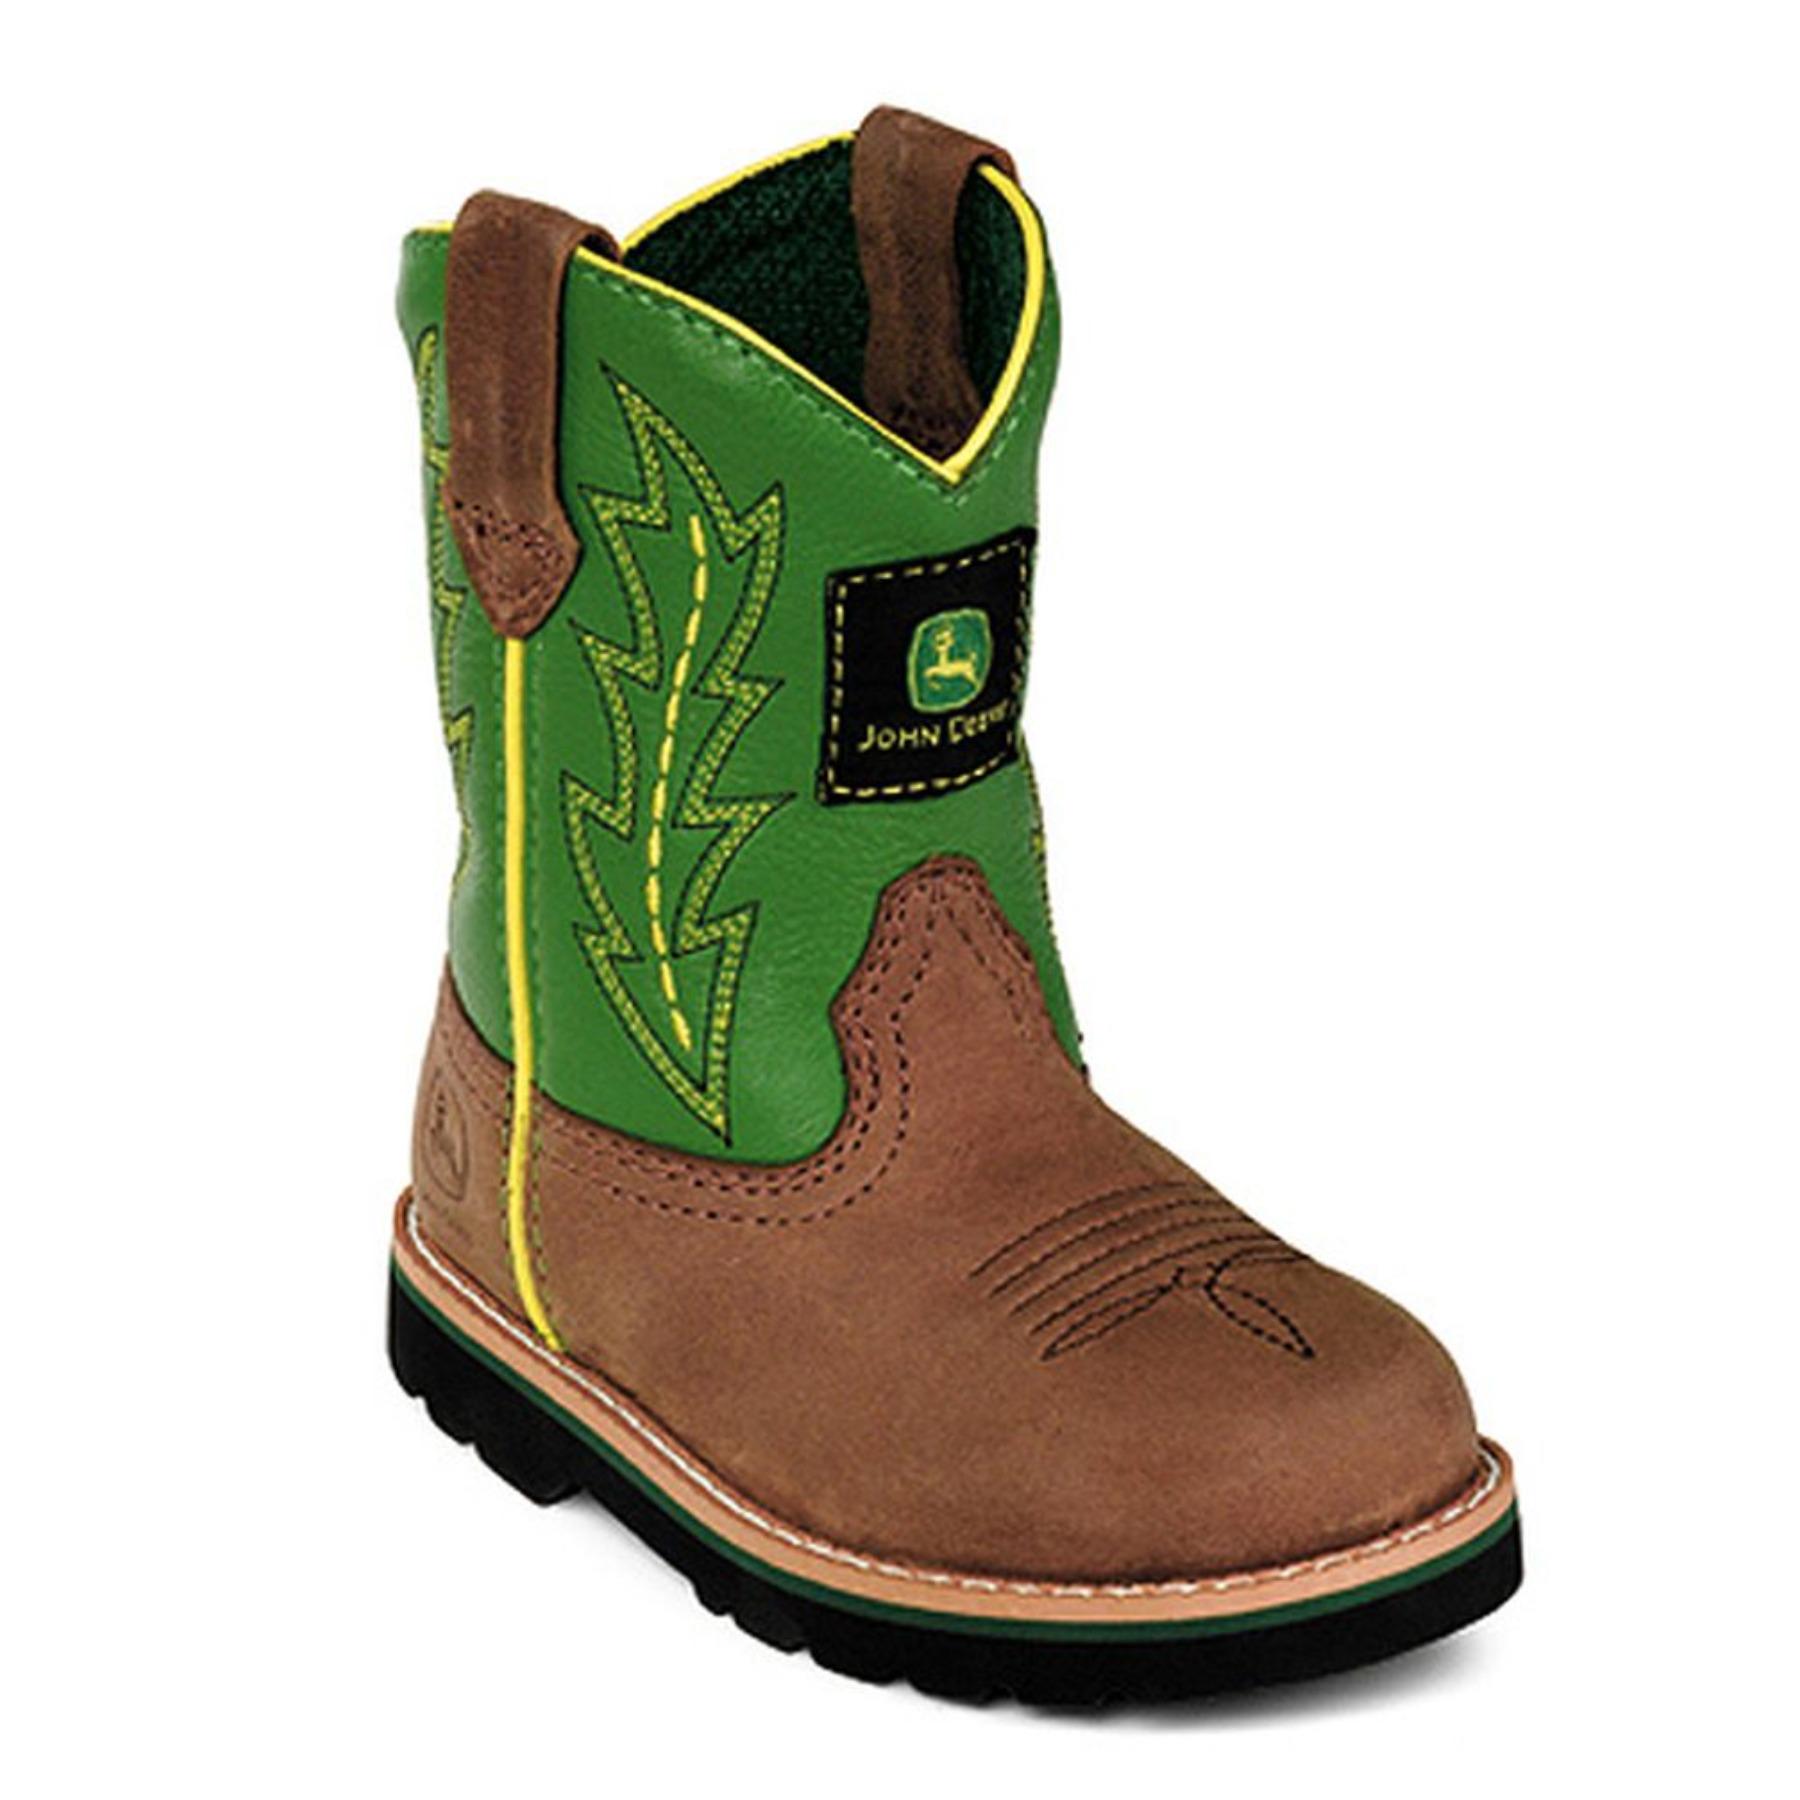 John Deere John Deere Unisex Kelly Green Leather Western Boots Toddler ...